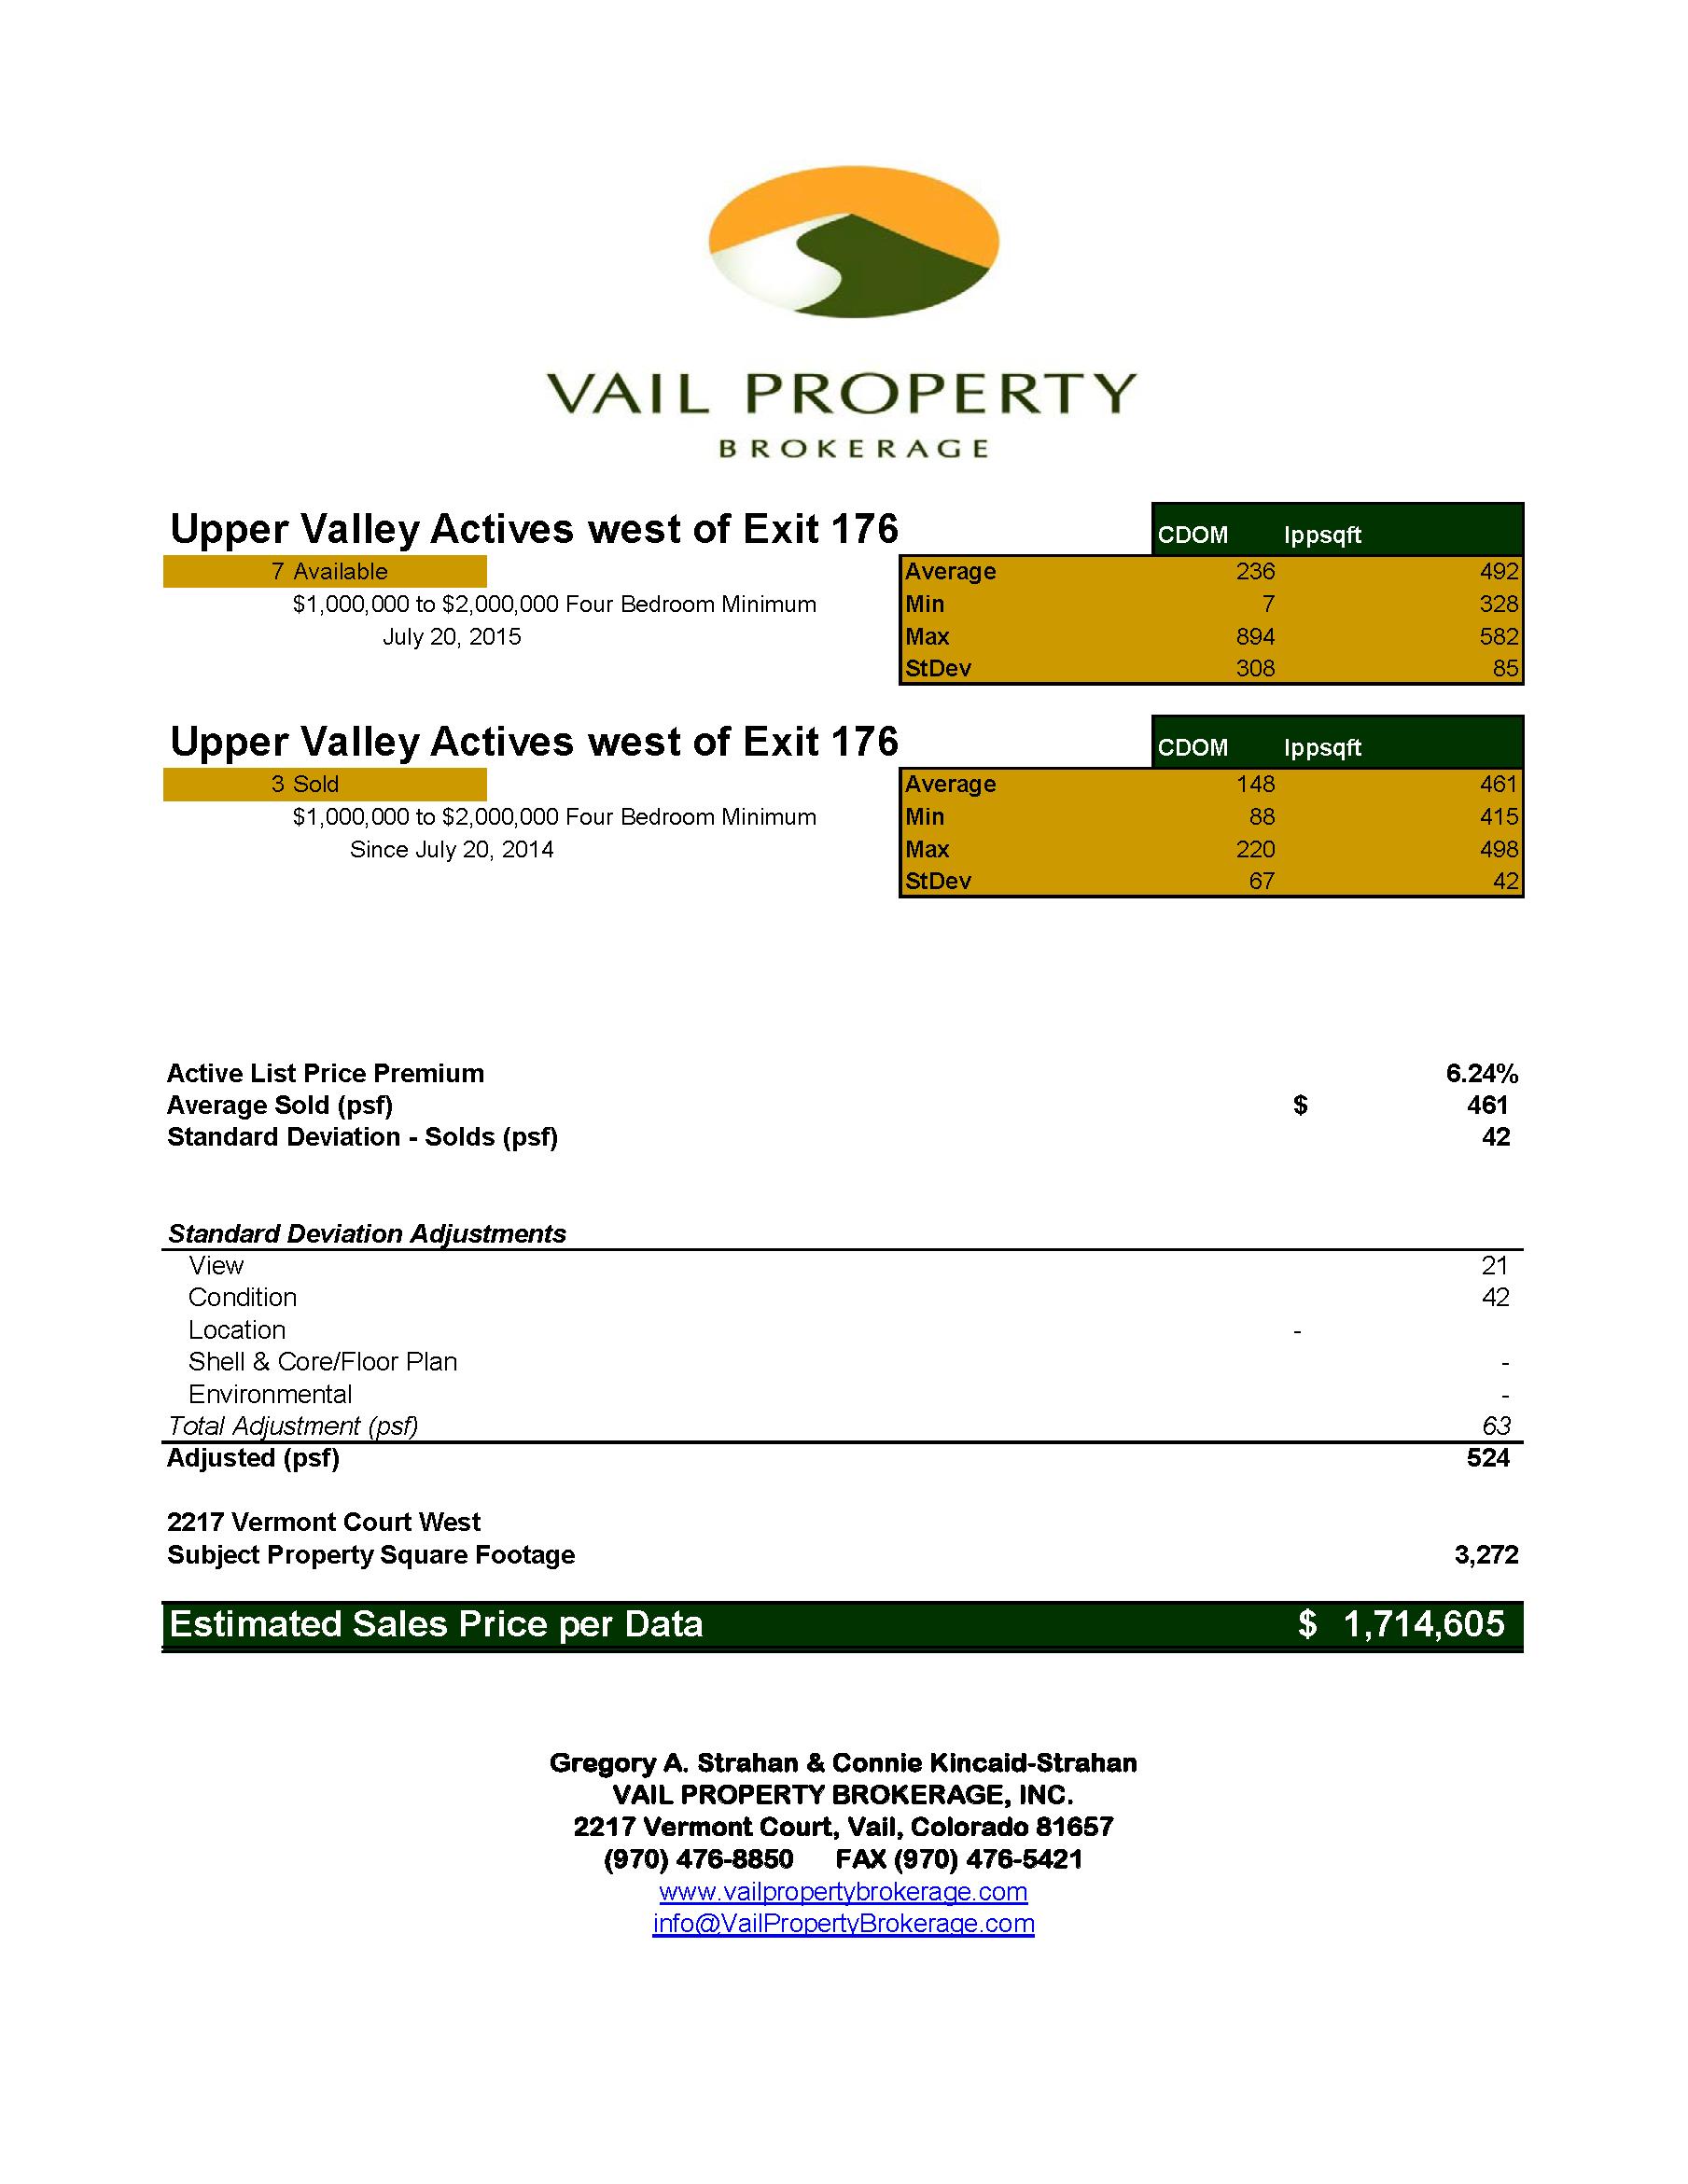 vailpropertybrokerage.com VermontCt_OpValue